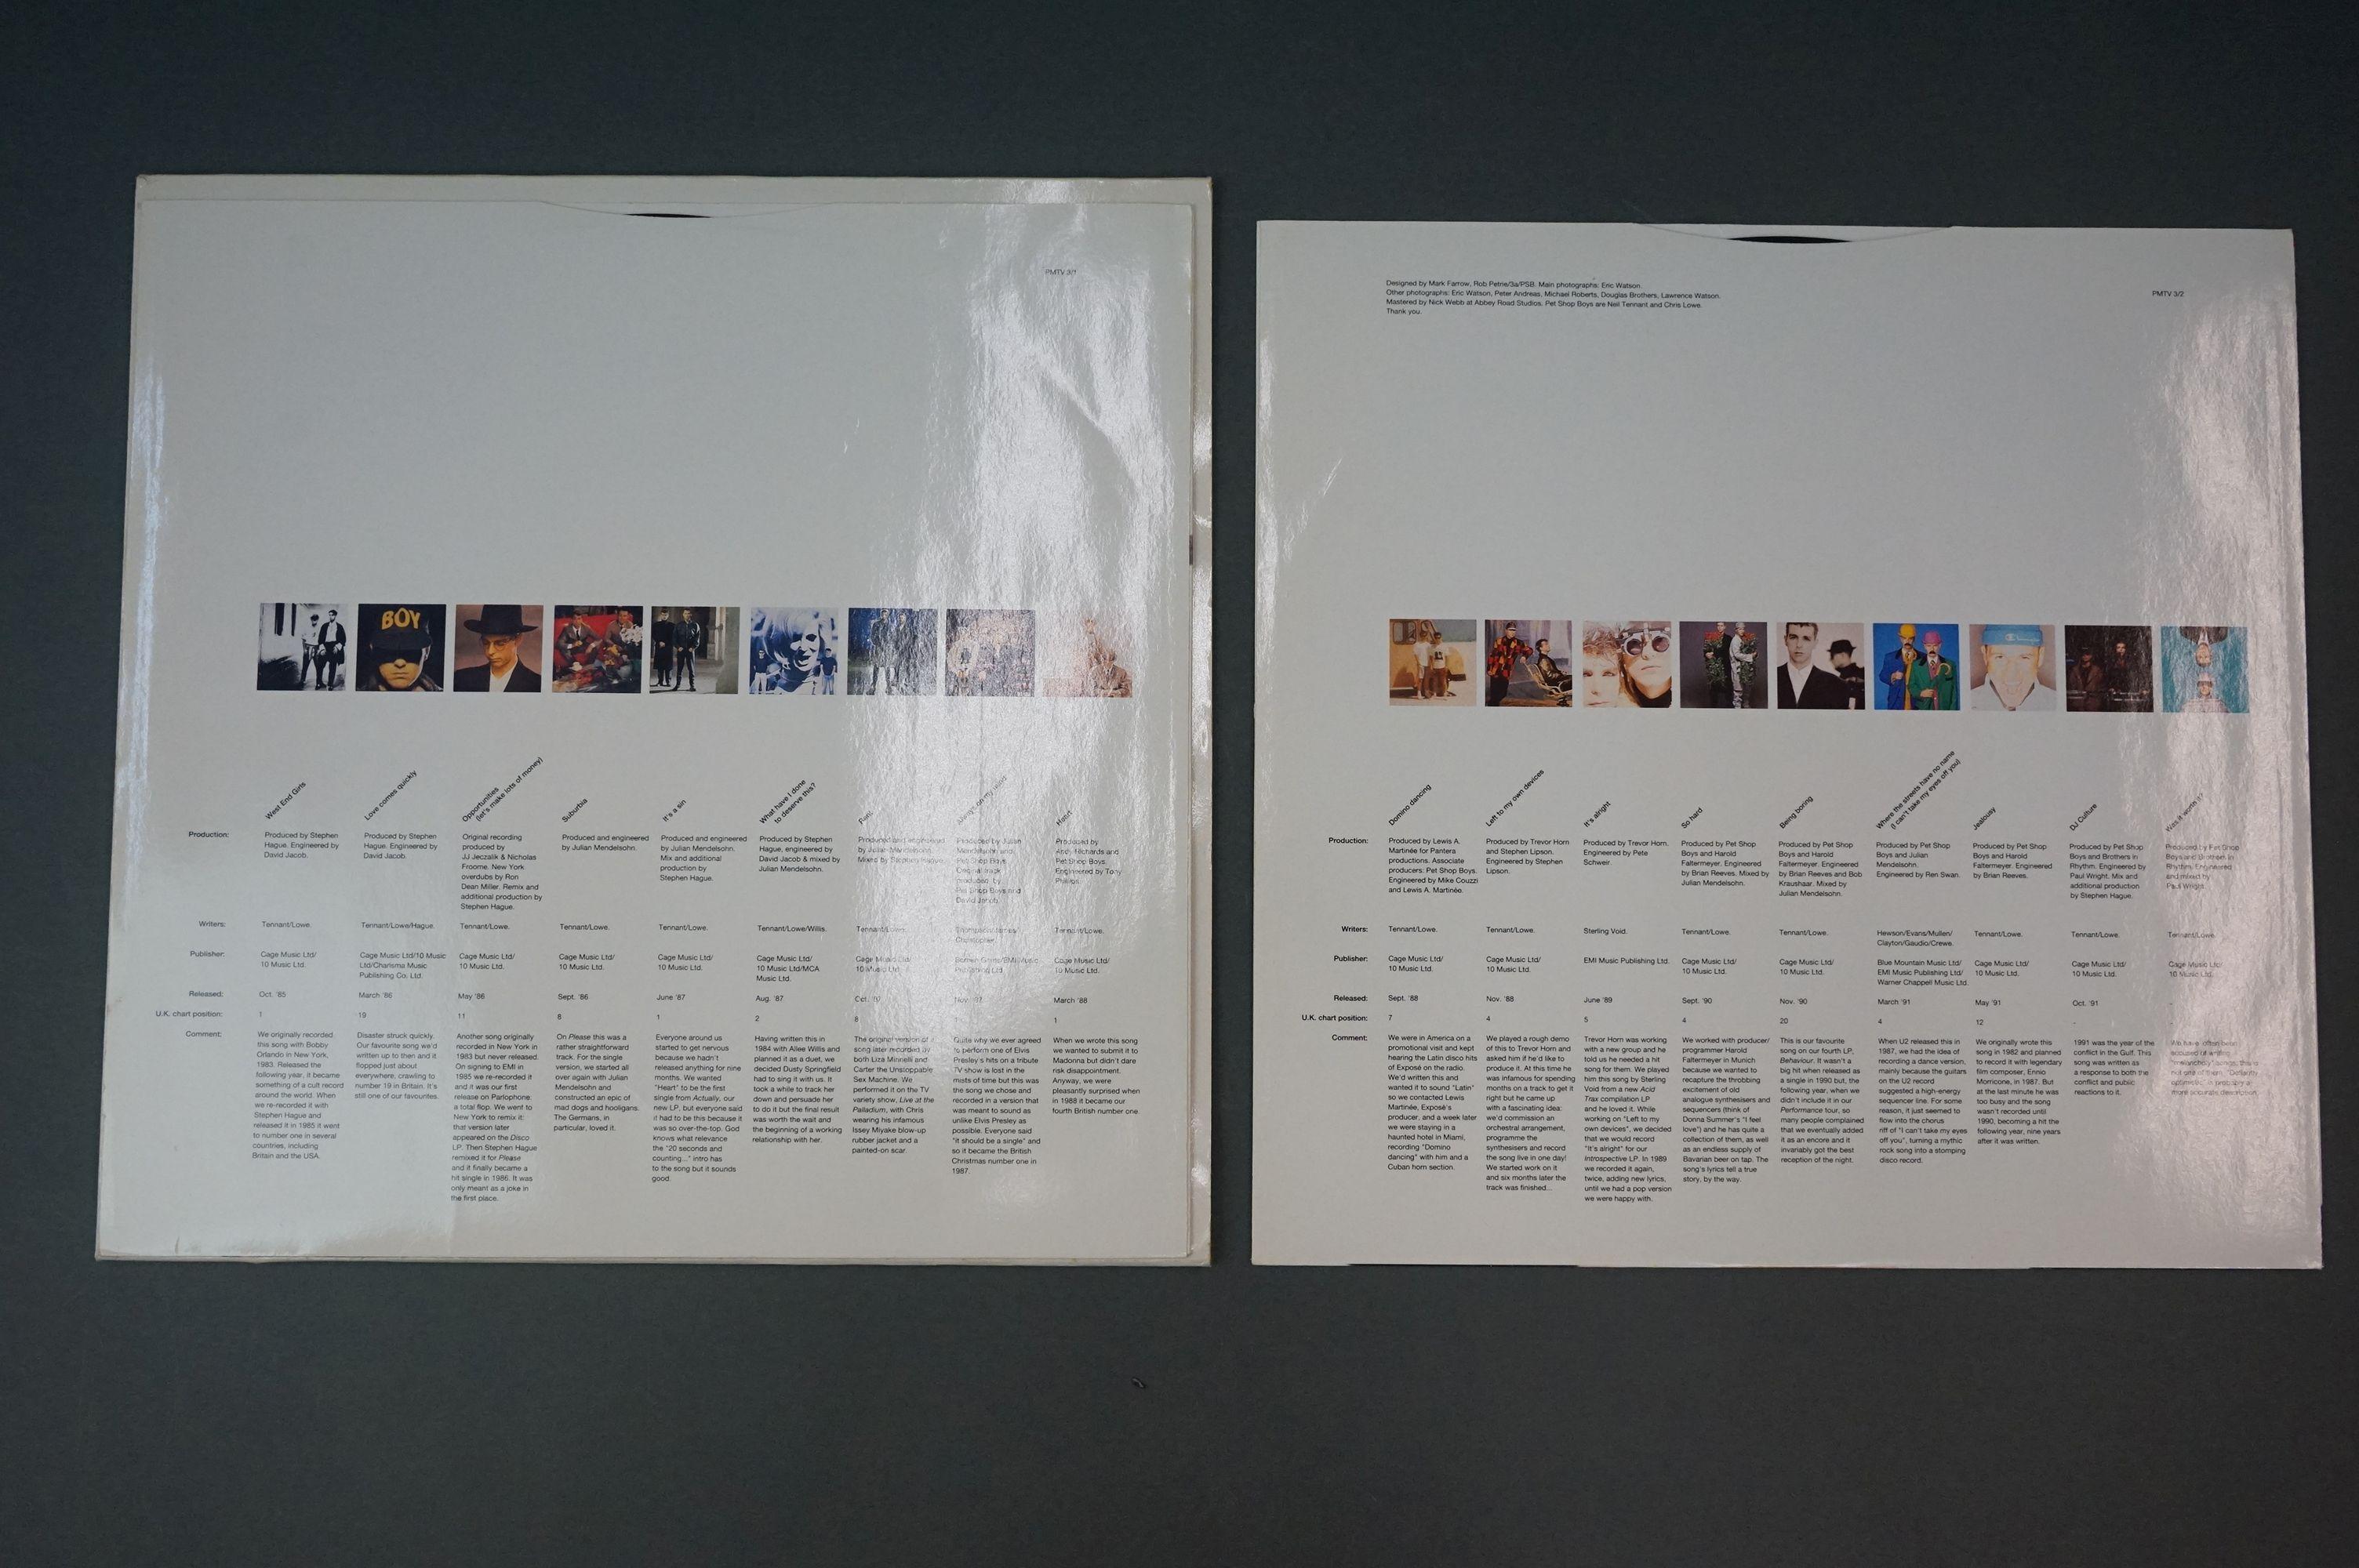 Vinyl - Pet Shop Boys Discography Double Album on Parlophone PMTV3 in sleeves ex, vinyl vg+ - Image 3 of 6